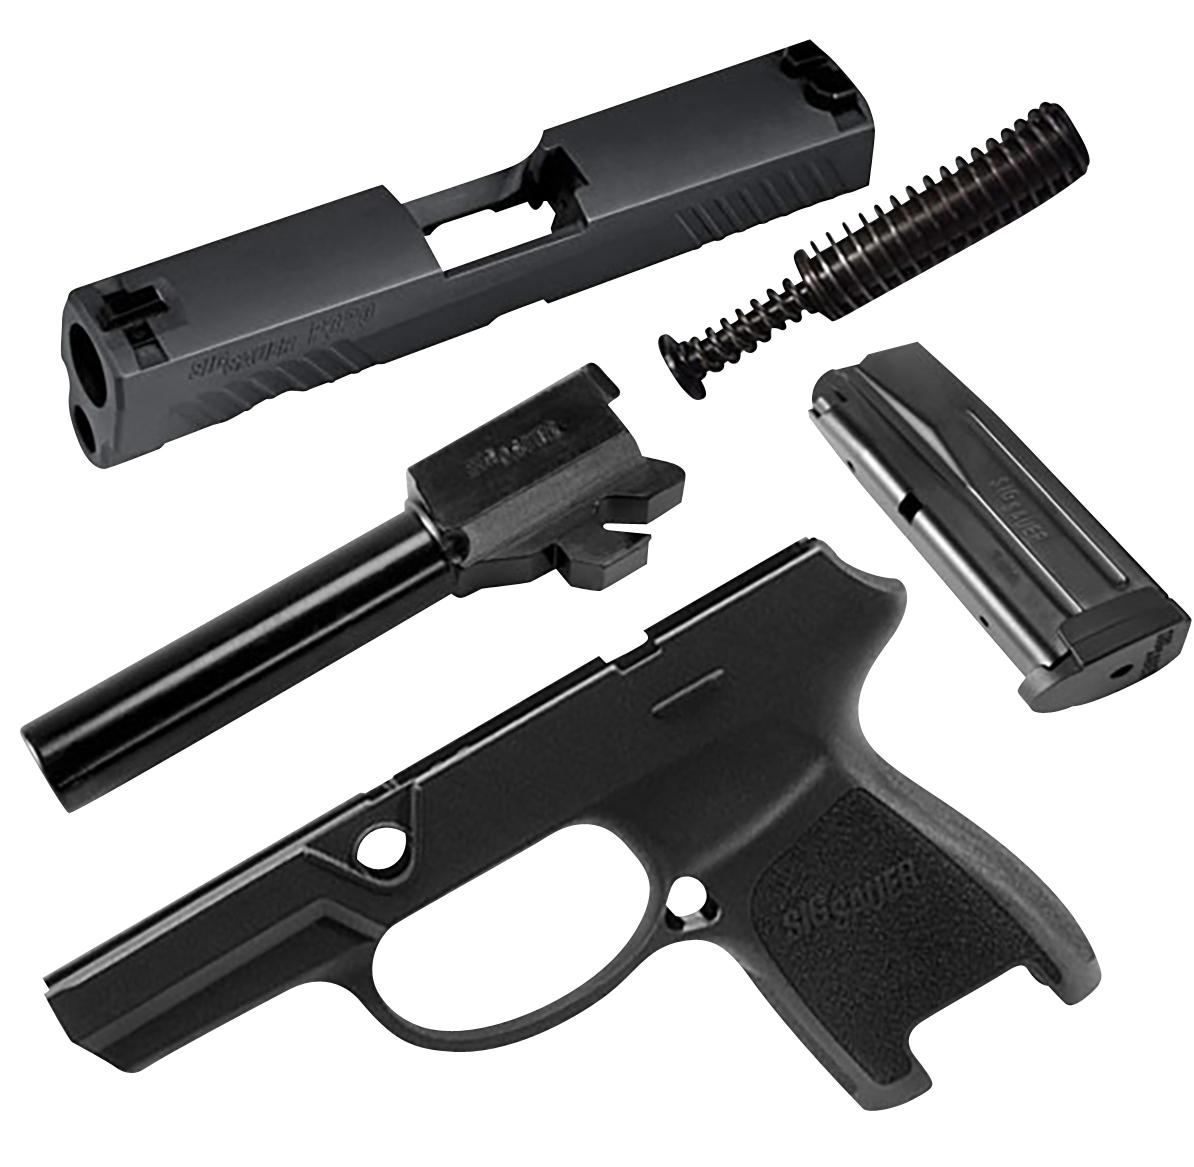 Sig Sauer CALX320SC9BSS P320 Subcompact X-Change Kit 9mm Luger Sig 320 Handgun Black